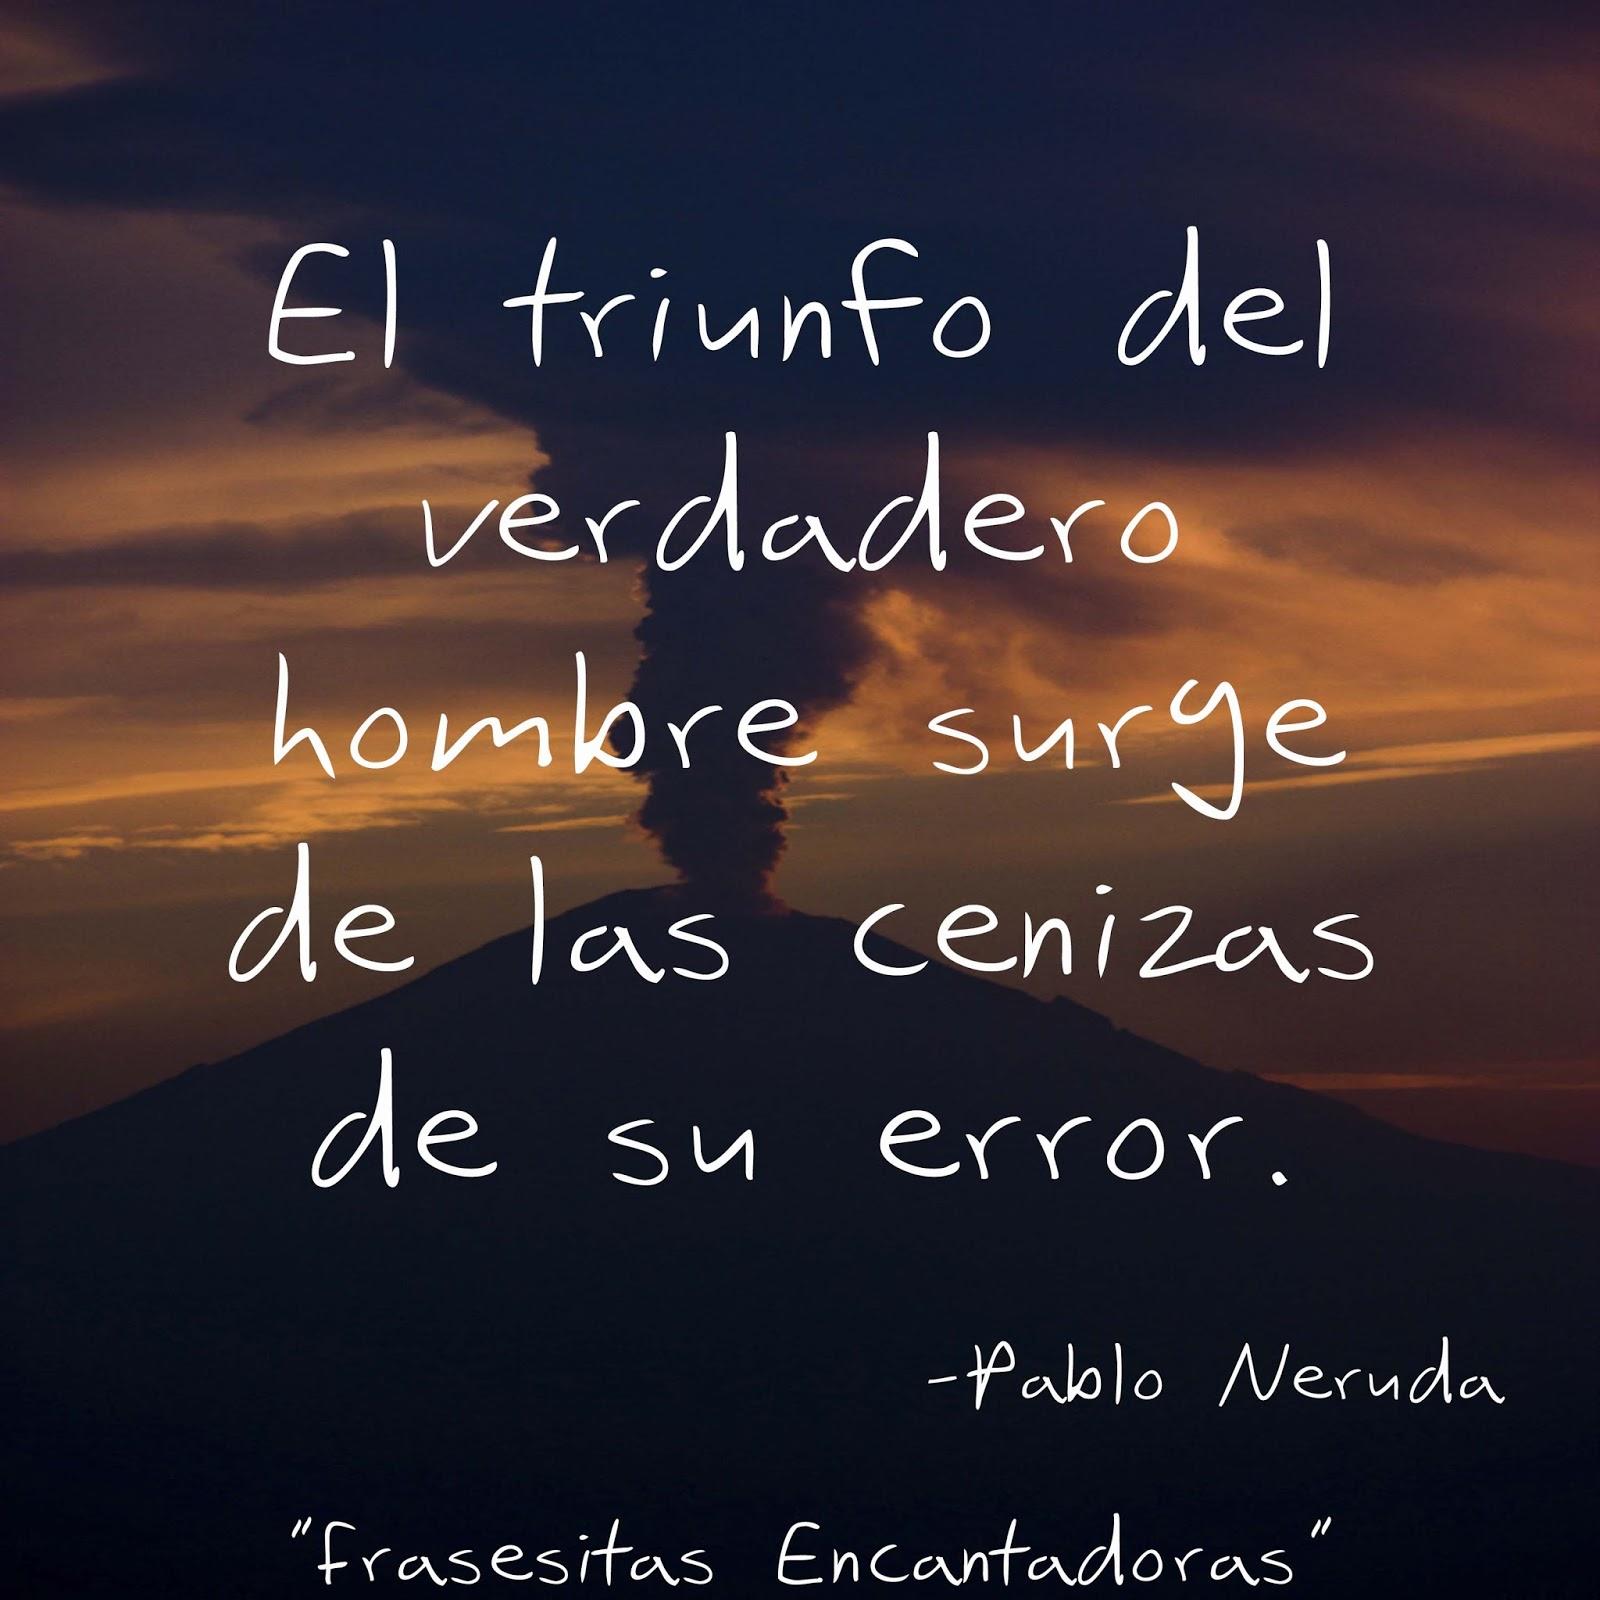 Frasesitas Encantadoras Frases Cortas De Pablo Neruda 2013